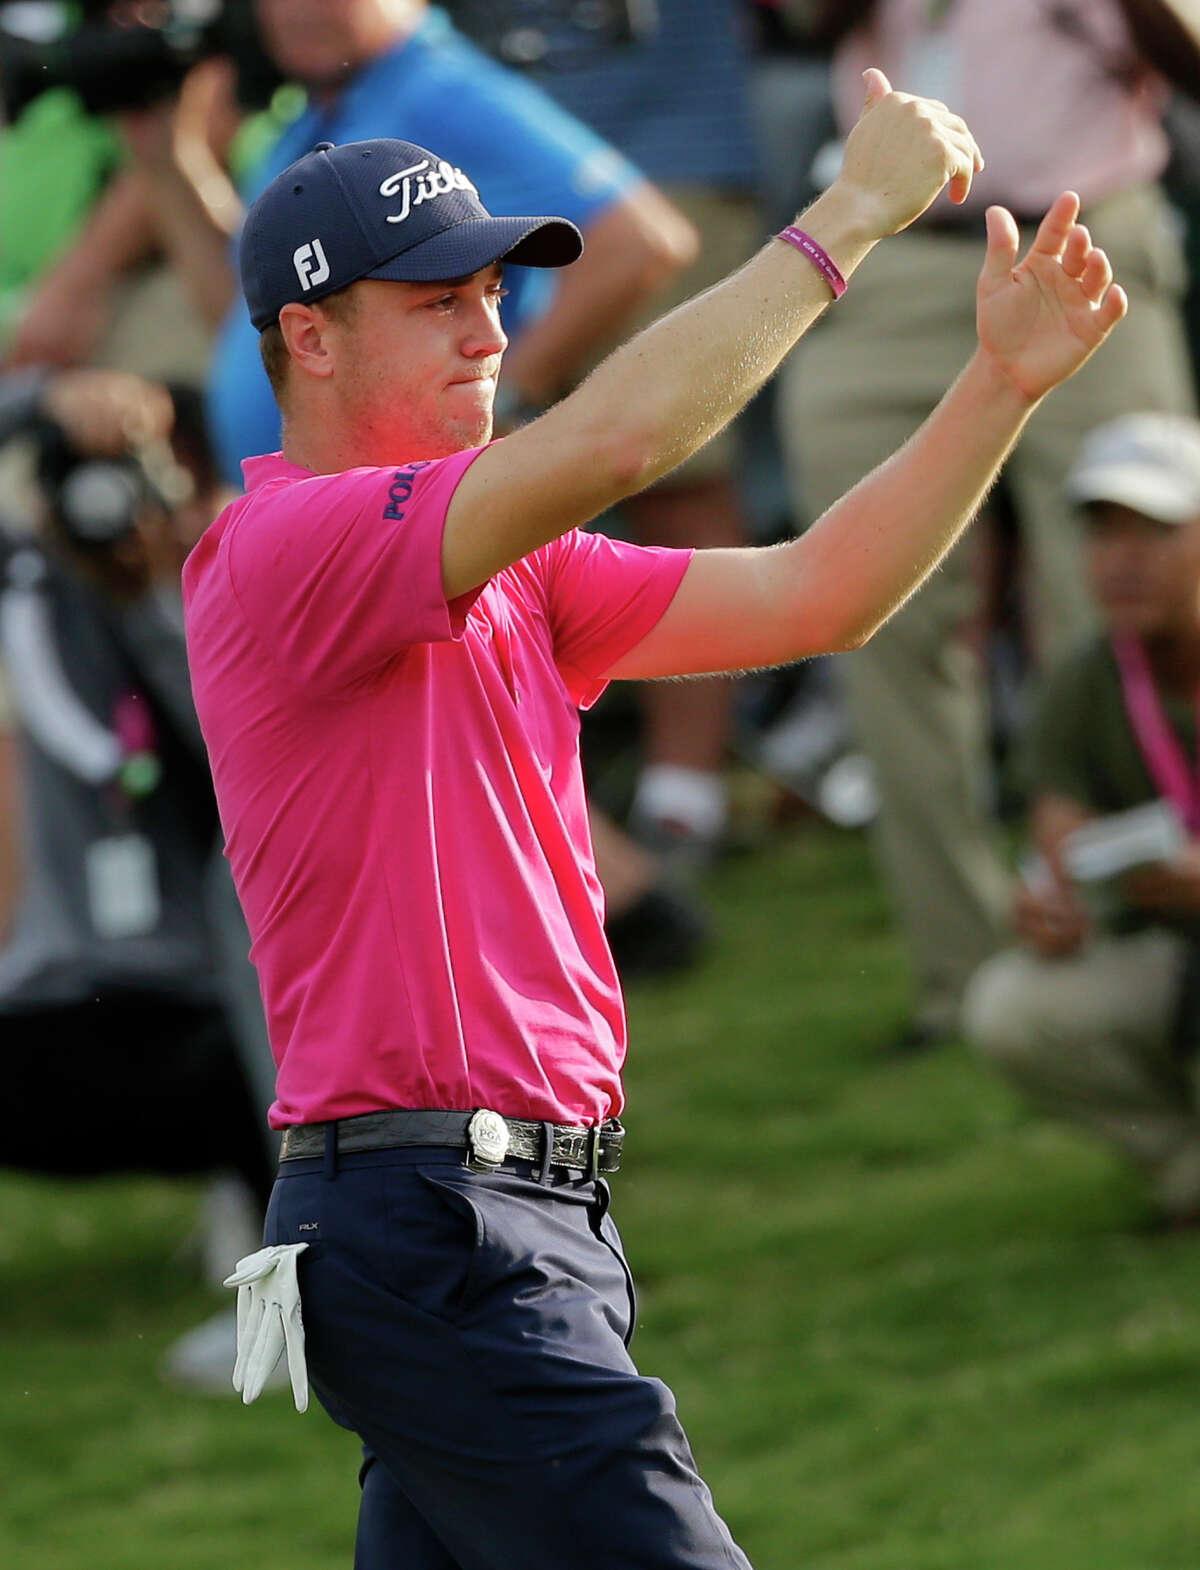 Justin Thomas celebrates after the final round of the PGA Championship golf tournament at the Quail Hollow Club Sunday, Aug. 13, 2017, in Charlotte, N.C. (AP Photo/Chuck Burton) ORG XMIT: PGA194